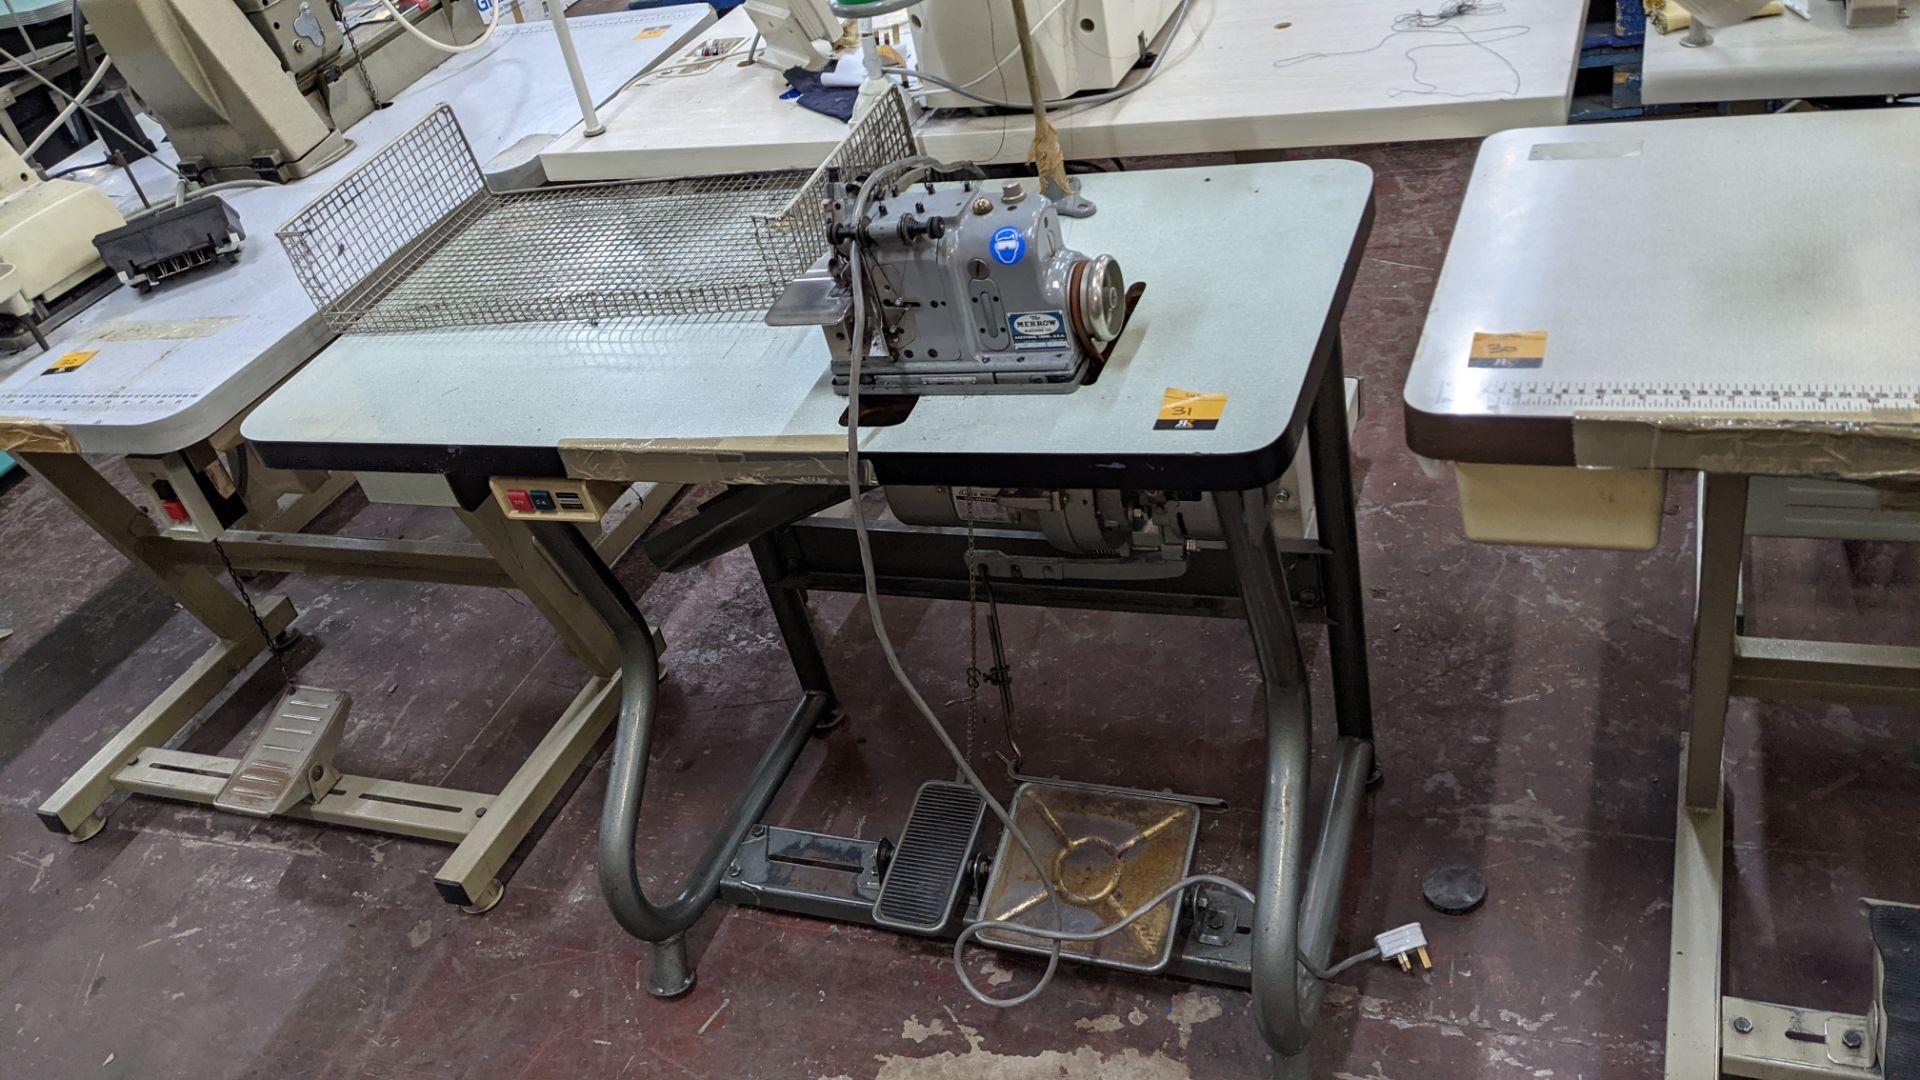 Merrow sewing machine, model M-30